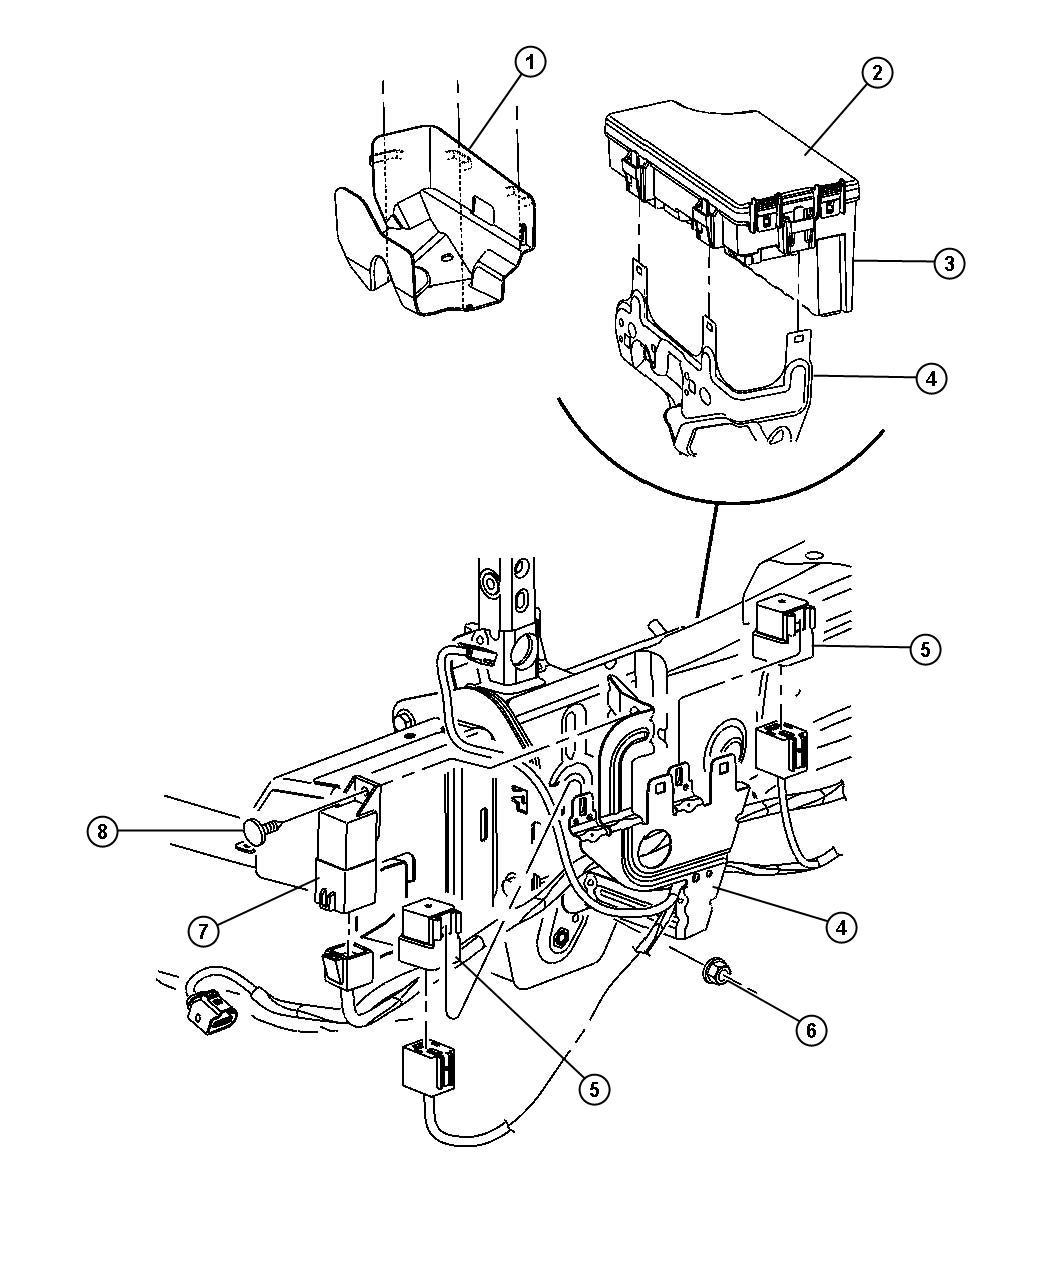 Jeep Compass Module Glow Plug Modules Compartment Engine